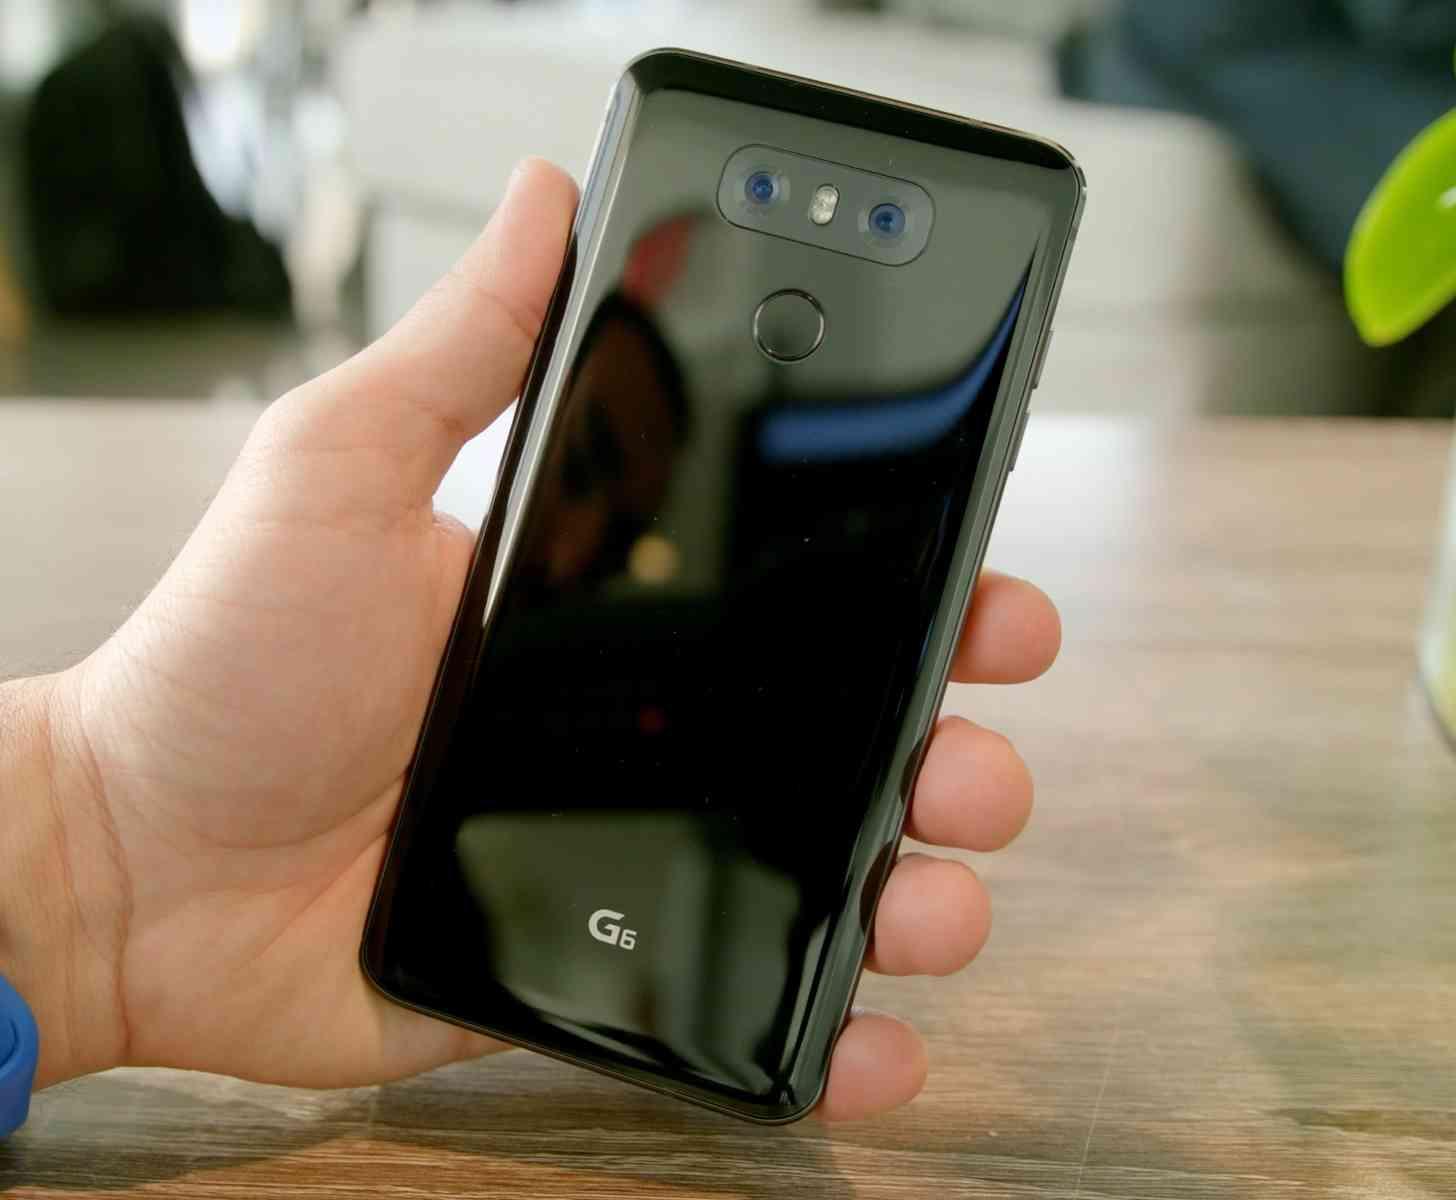 LG G6 rear hands-on